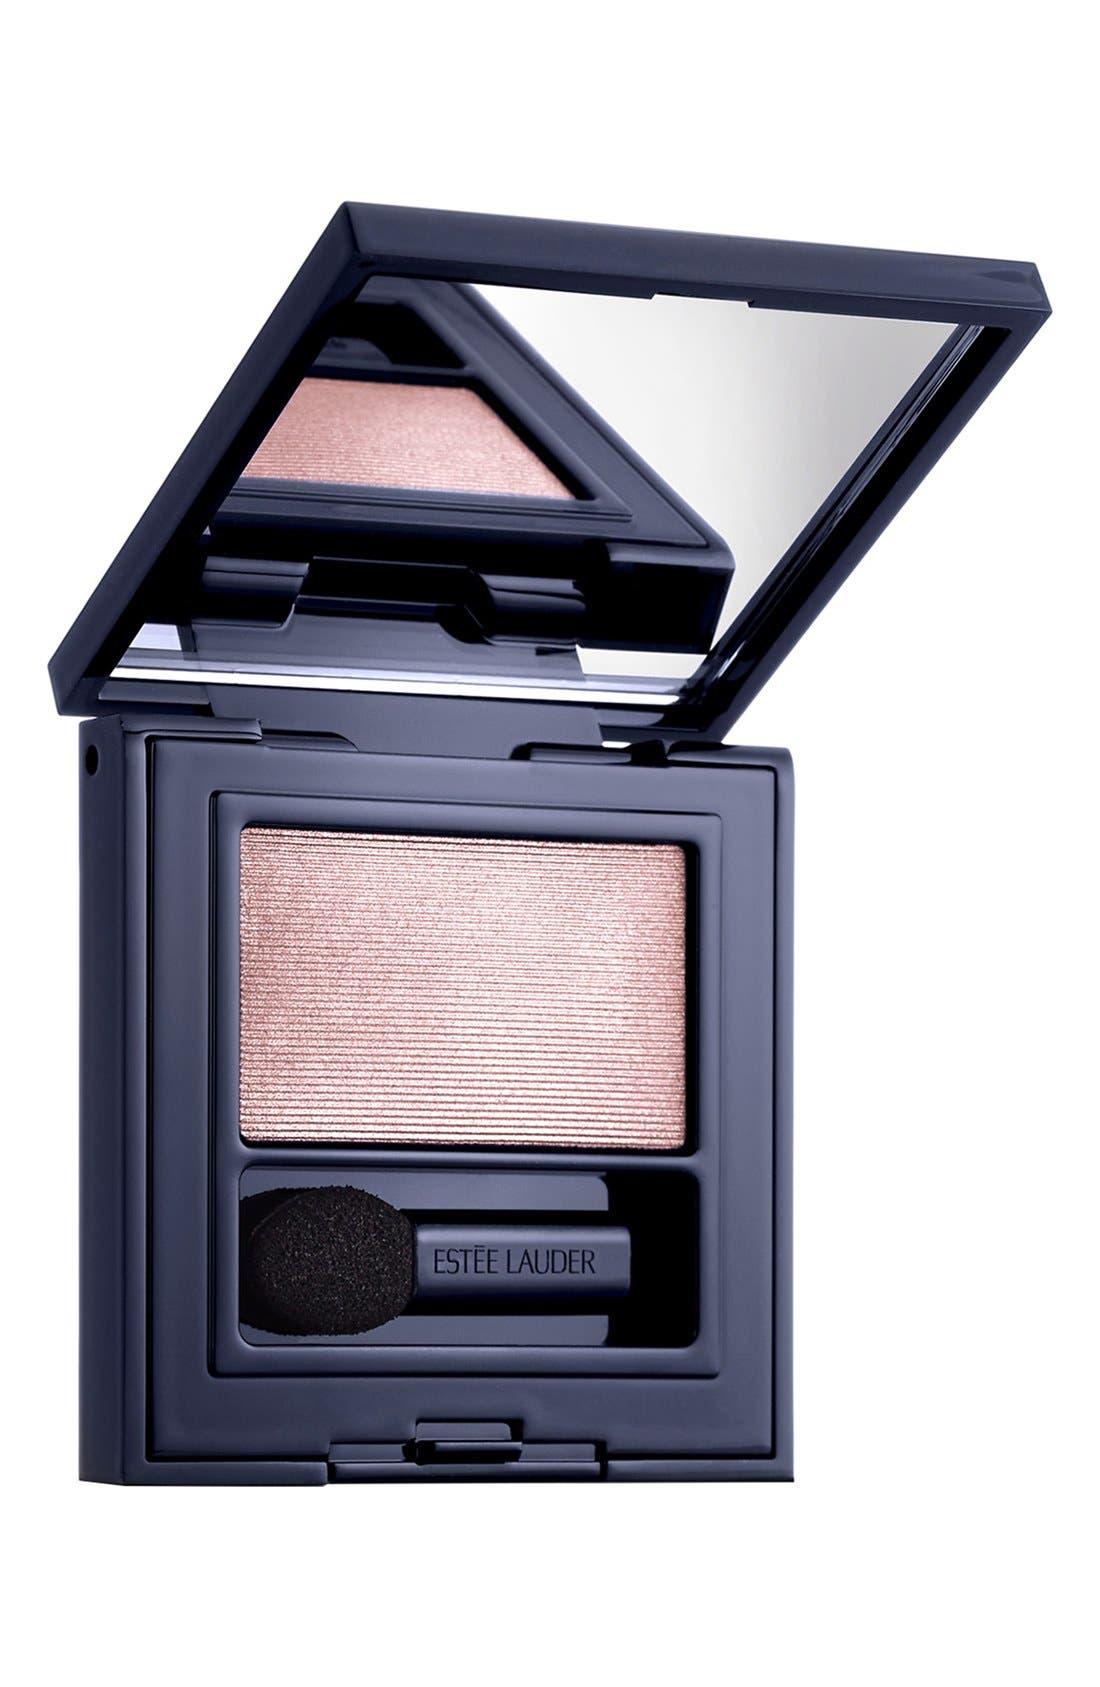 Estée Lauder Pure Color Envy Defining Wet/Dry Eyeshadow